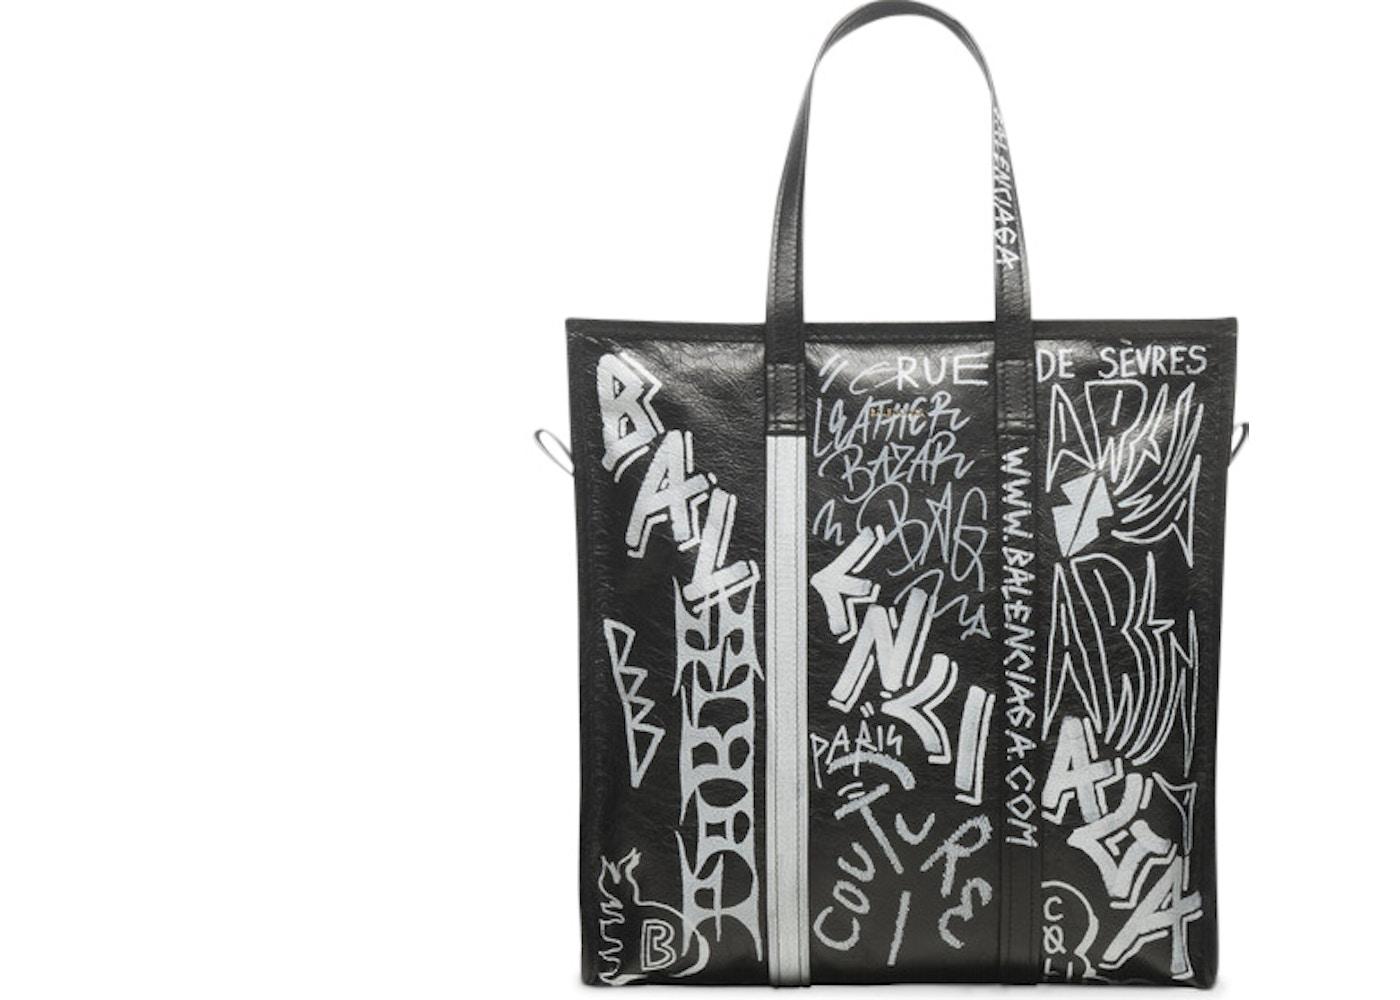 ec40ccae8187 Balenciaga Bazar Shopper Graffiti Medium Black White. Graffiti Medium Black  White